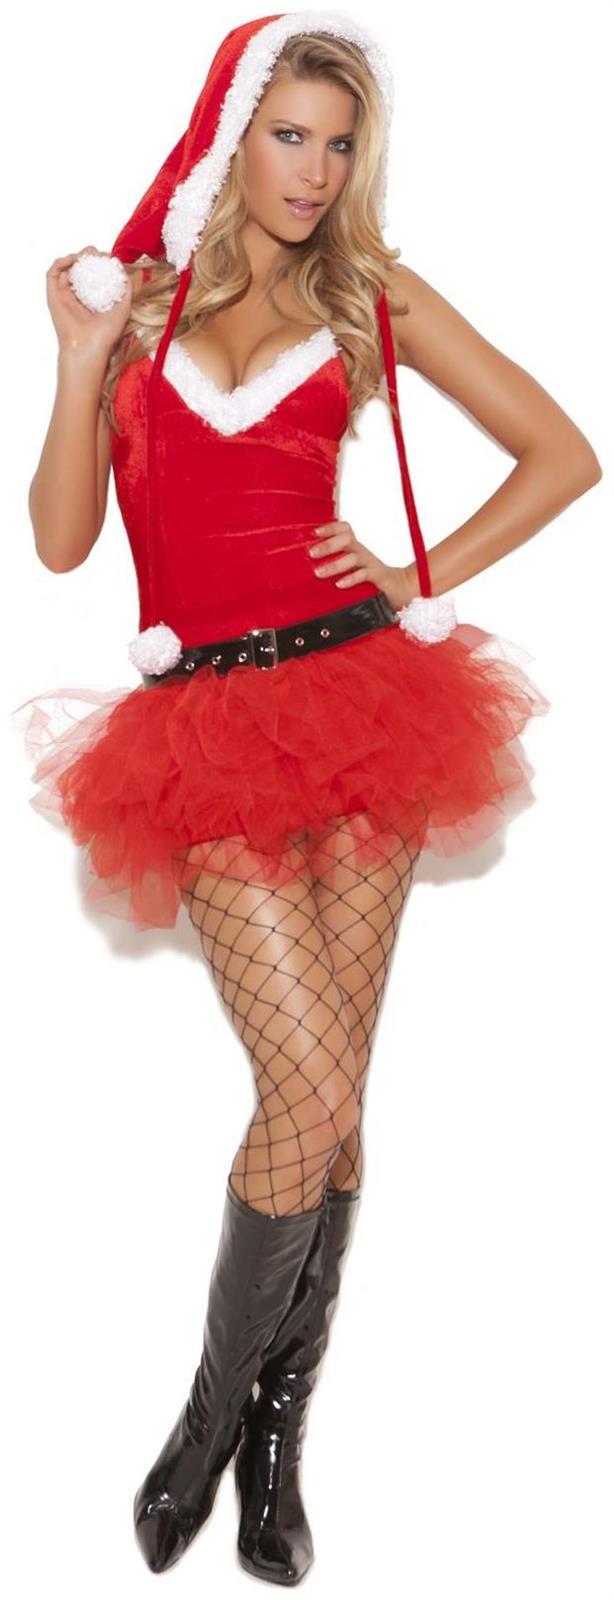 http://www.spicylegs.com/p-38453-3-pc-santas-sweetie-costume.aspx